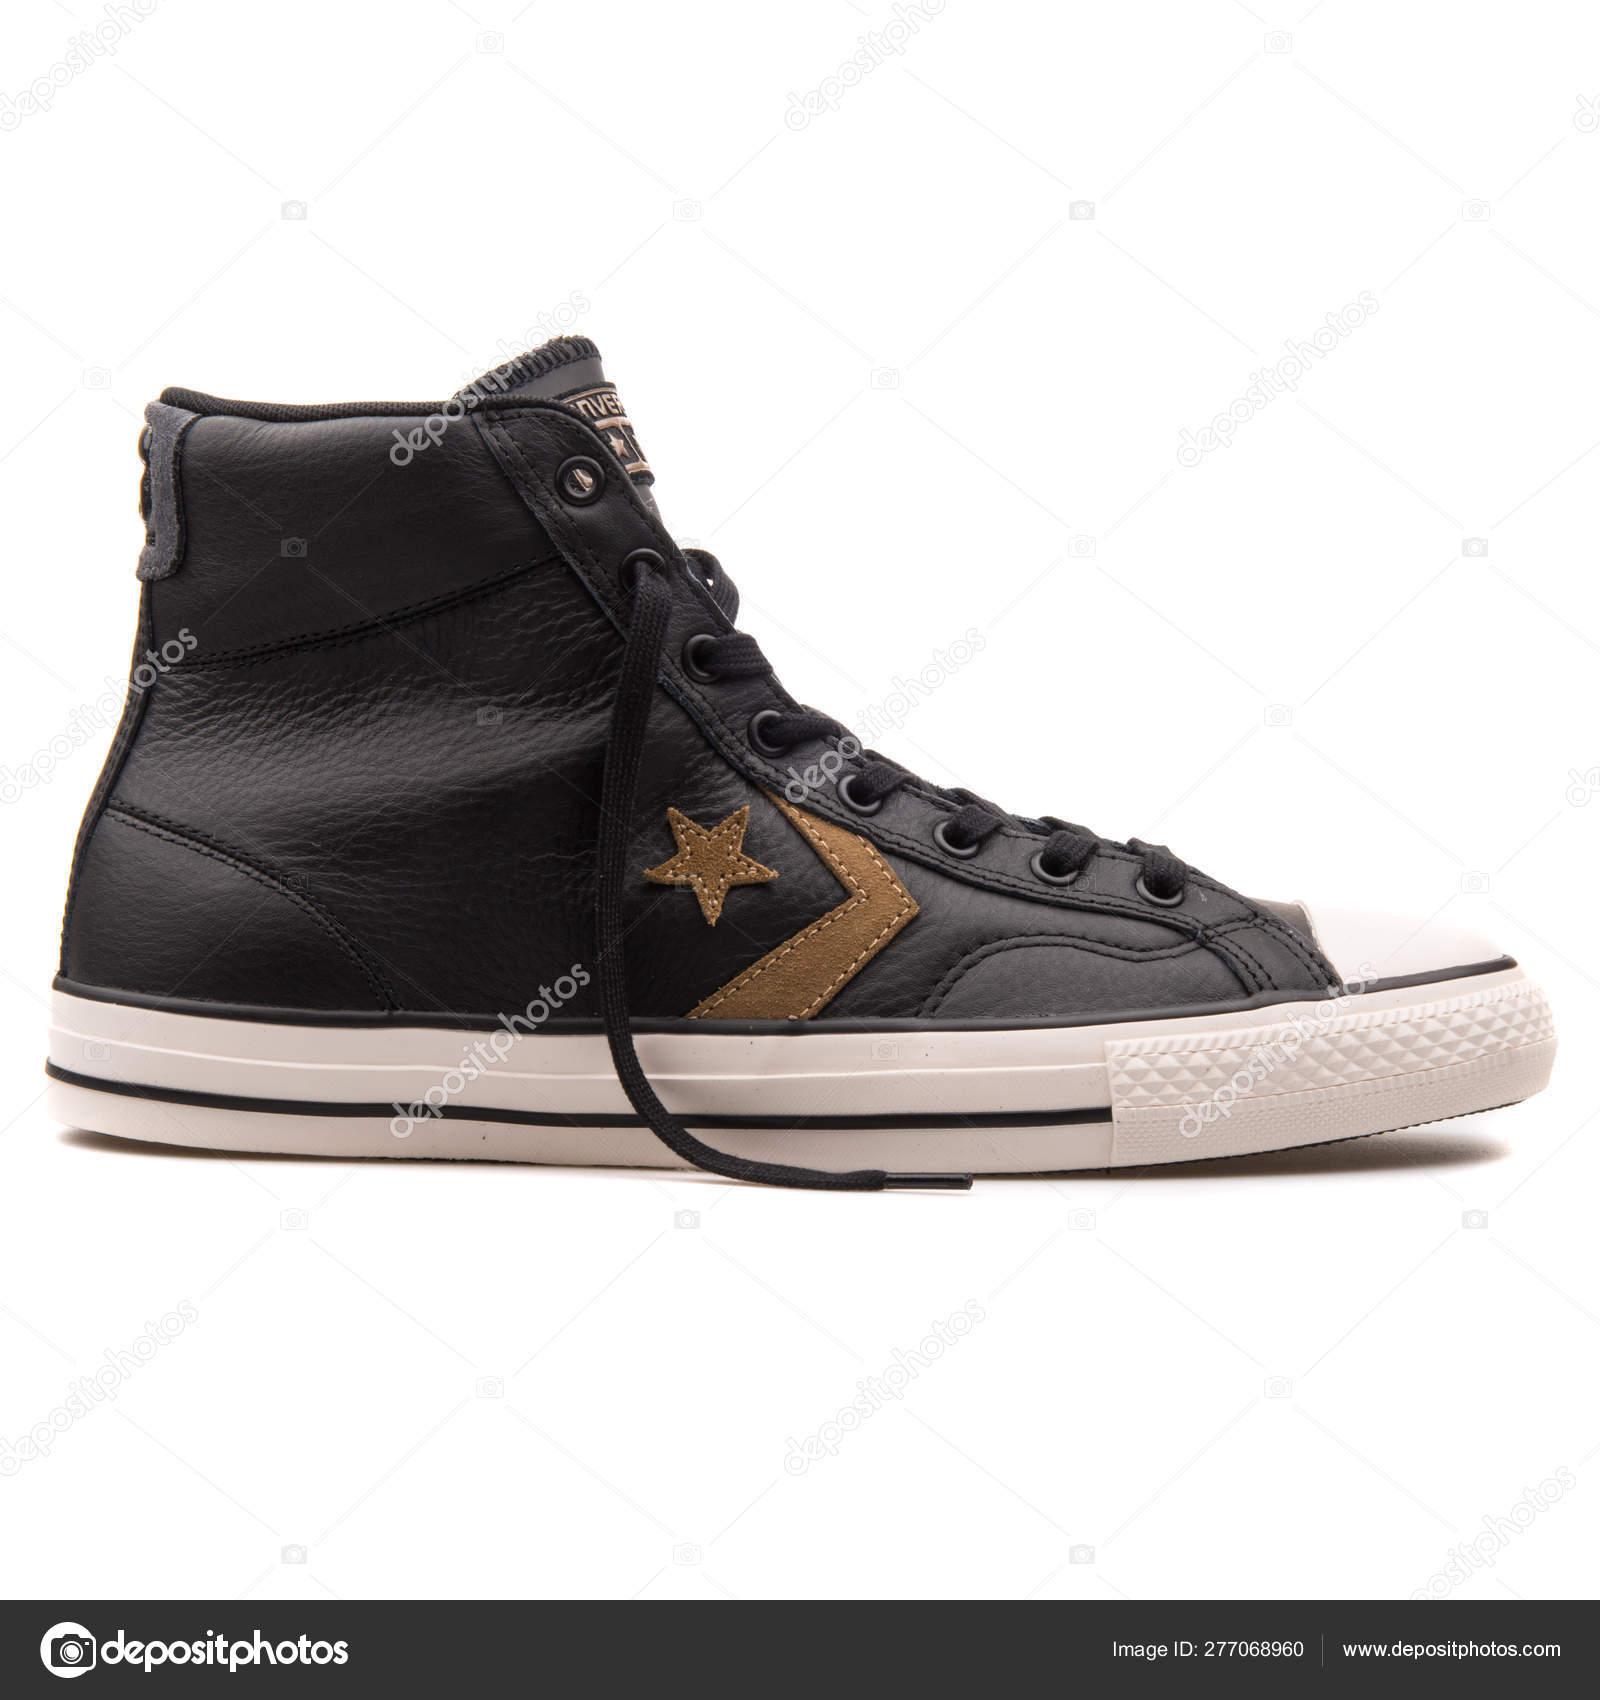 Converse Star Player High black sneaker